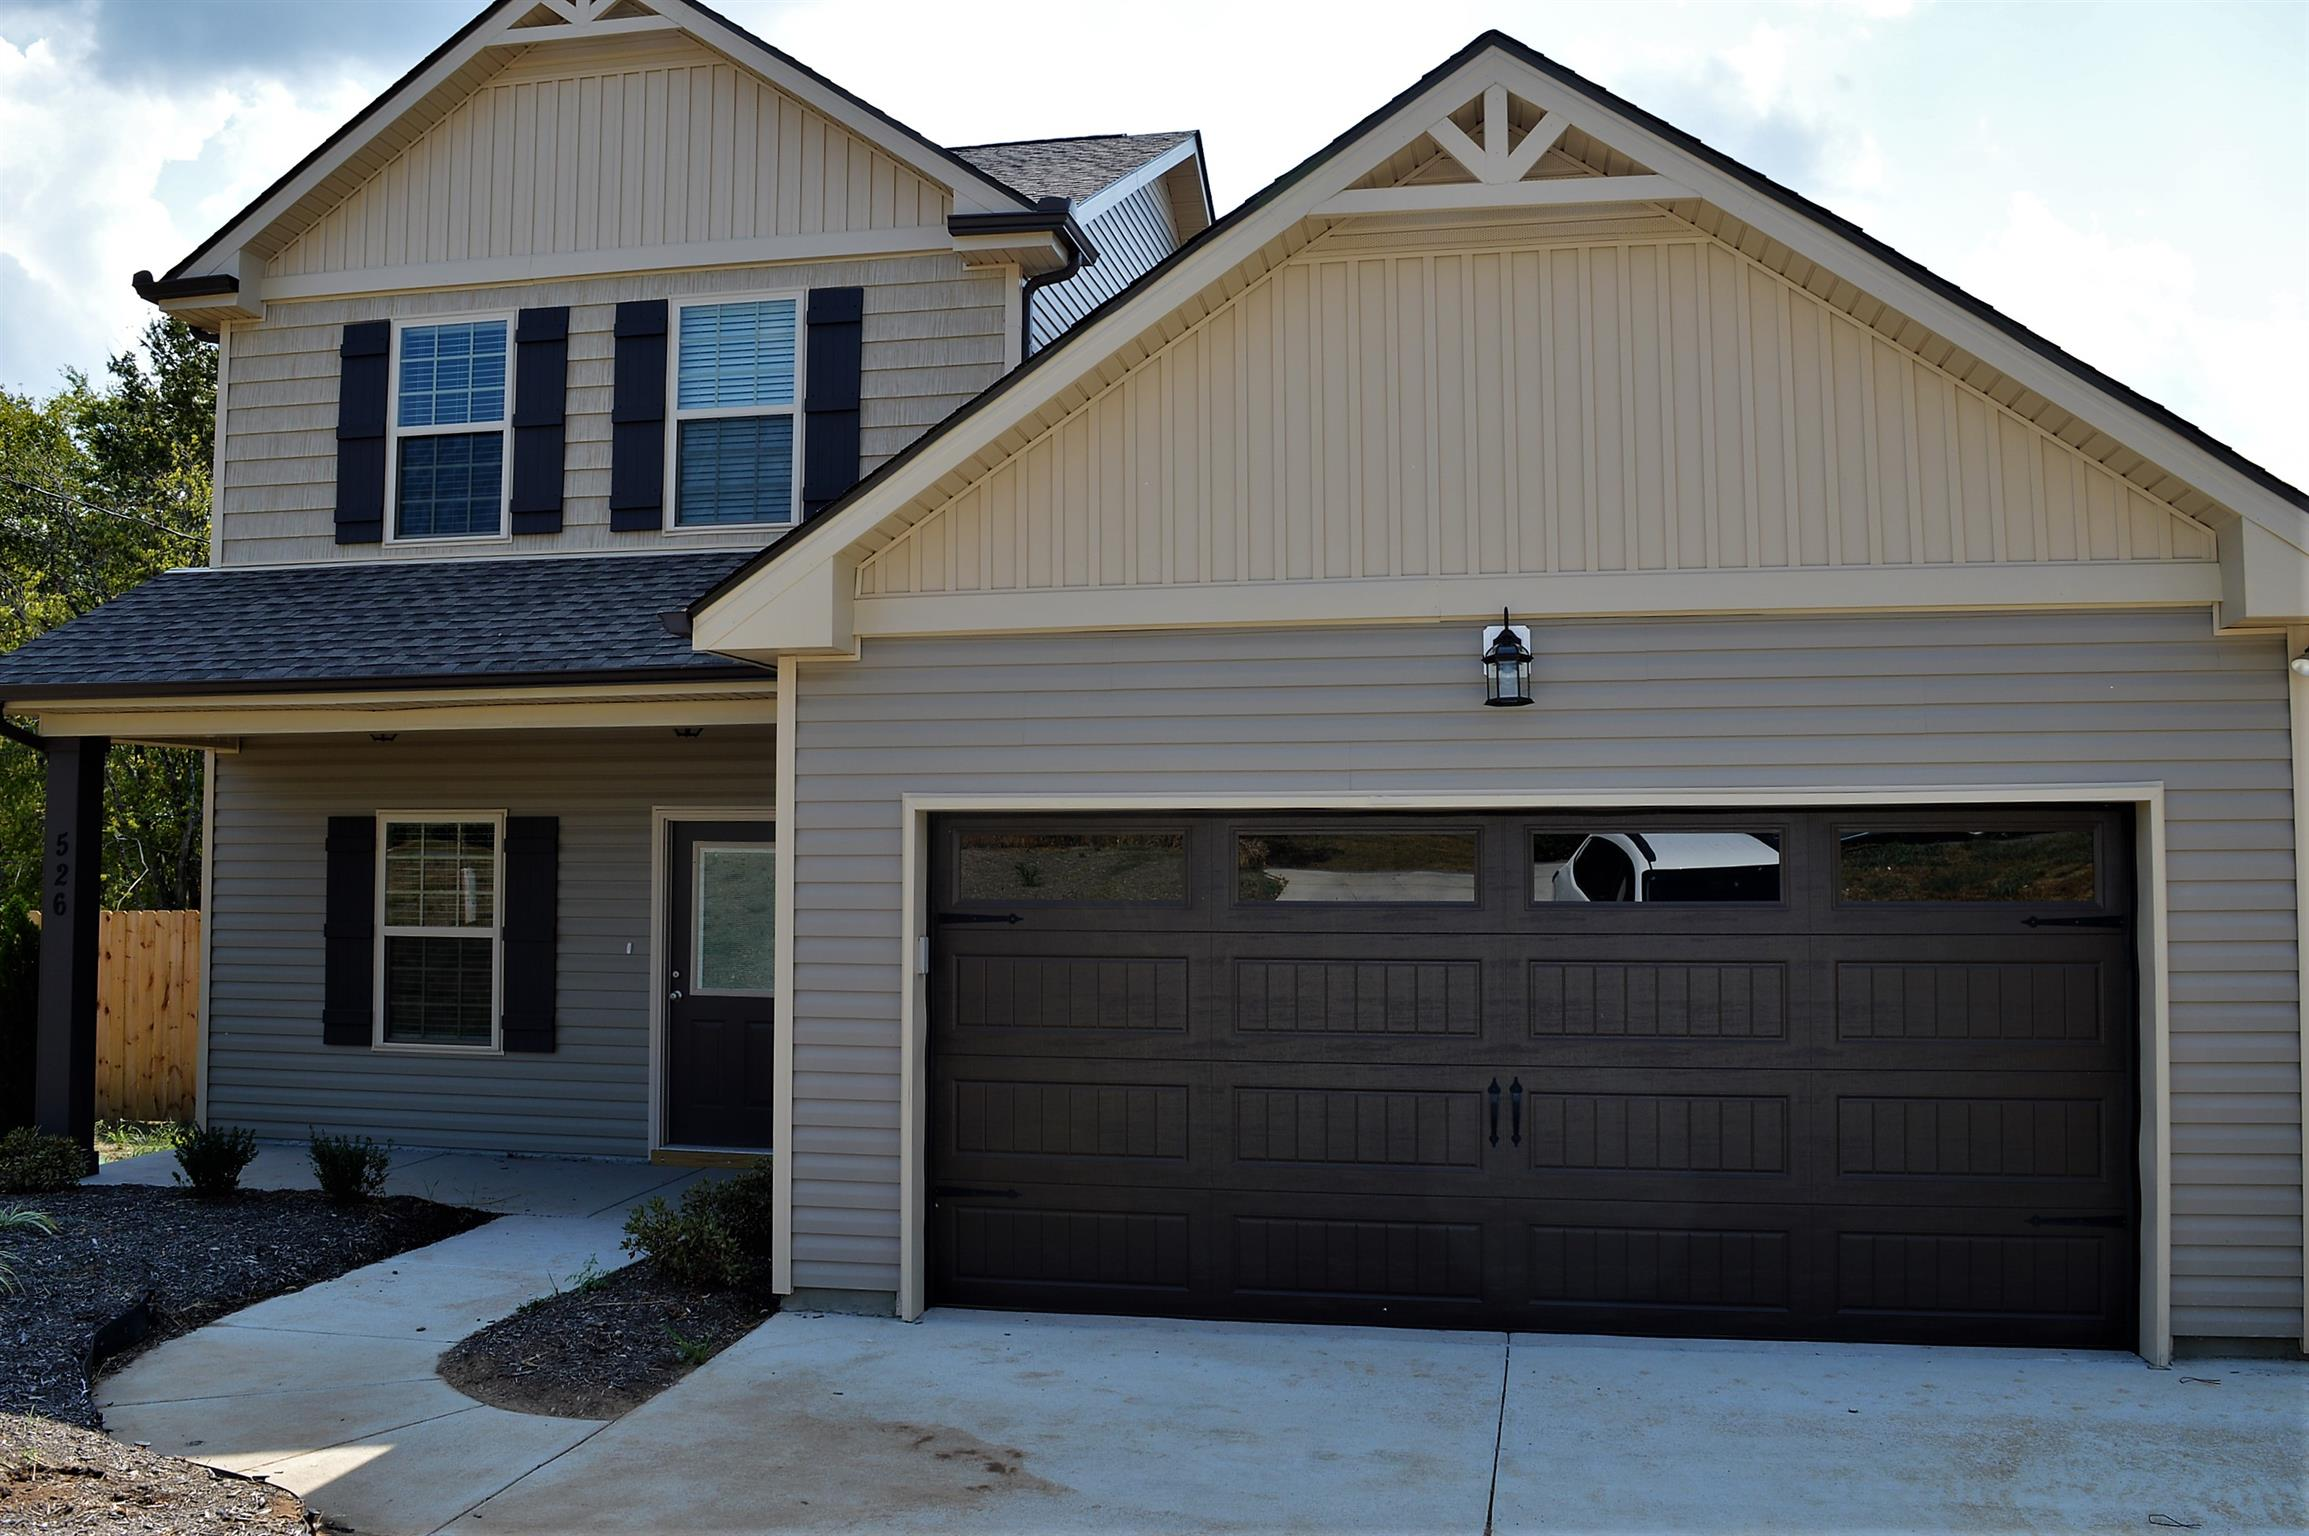 526 Sand Hill Rd, LA VERGNE, TN 37086 - LA VERGNE, TN real estate listing